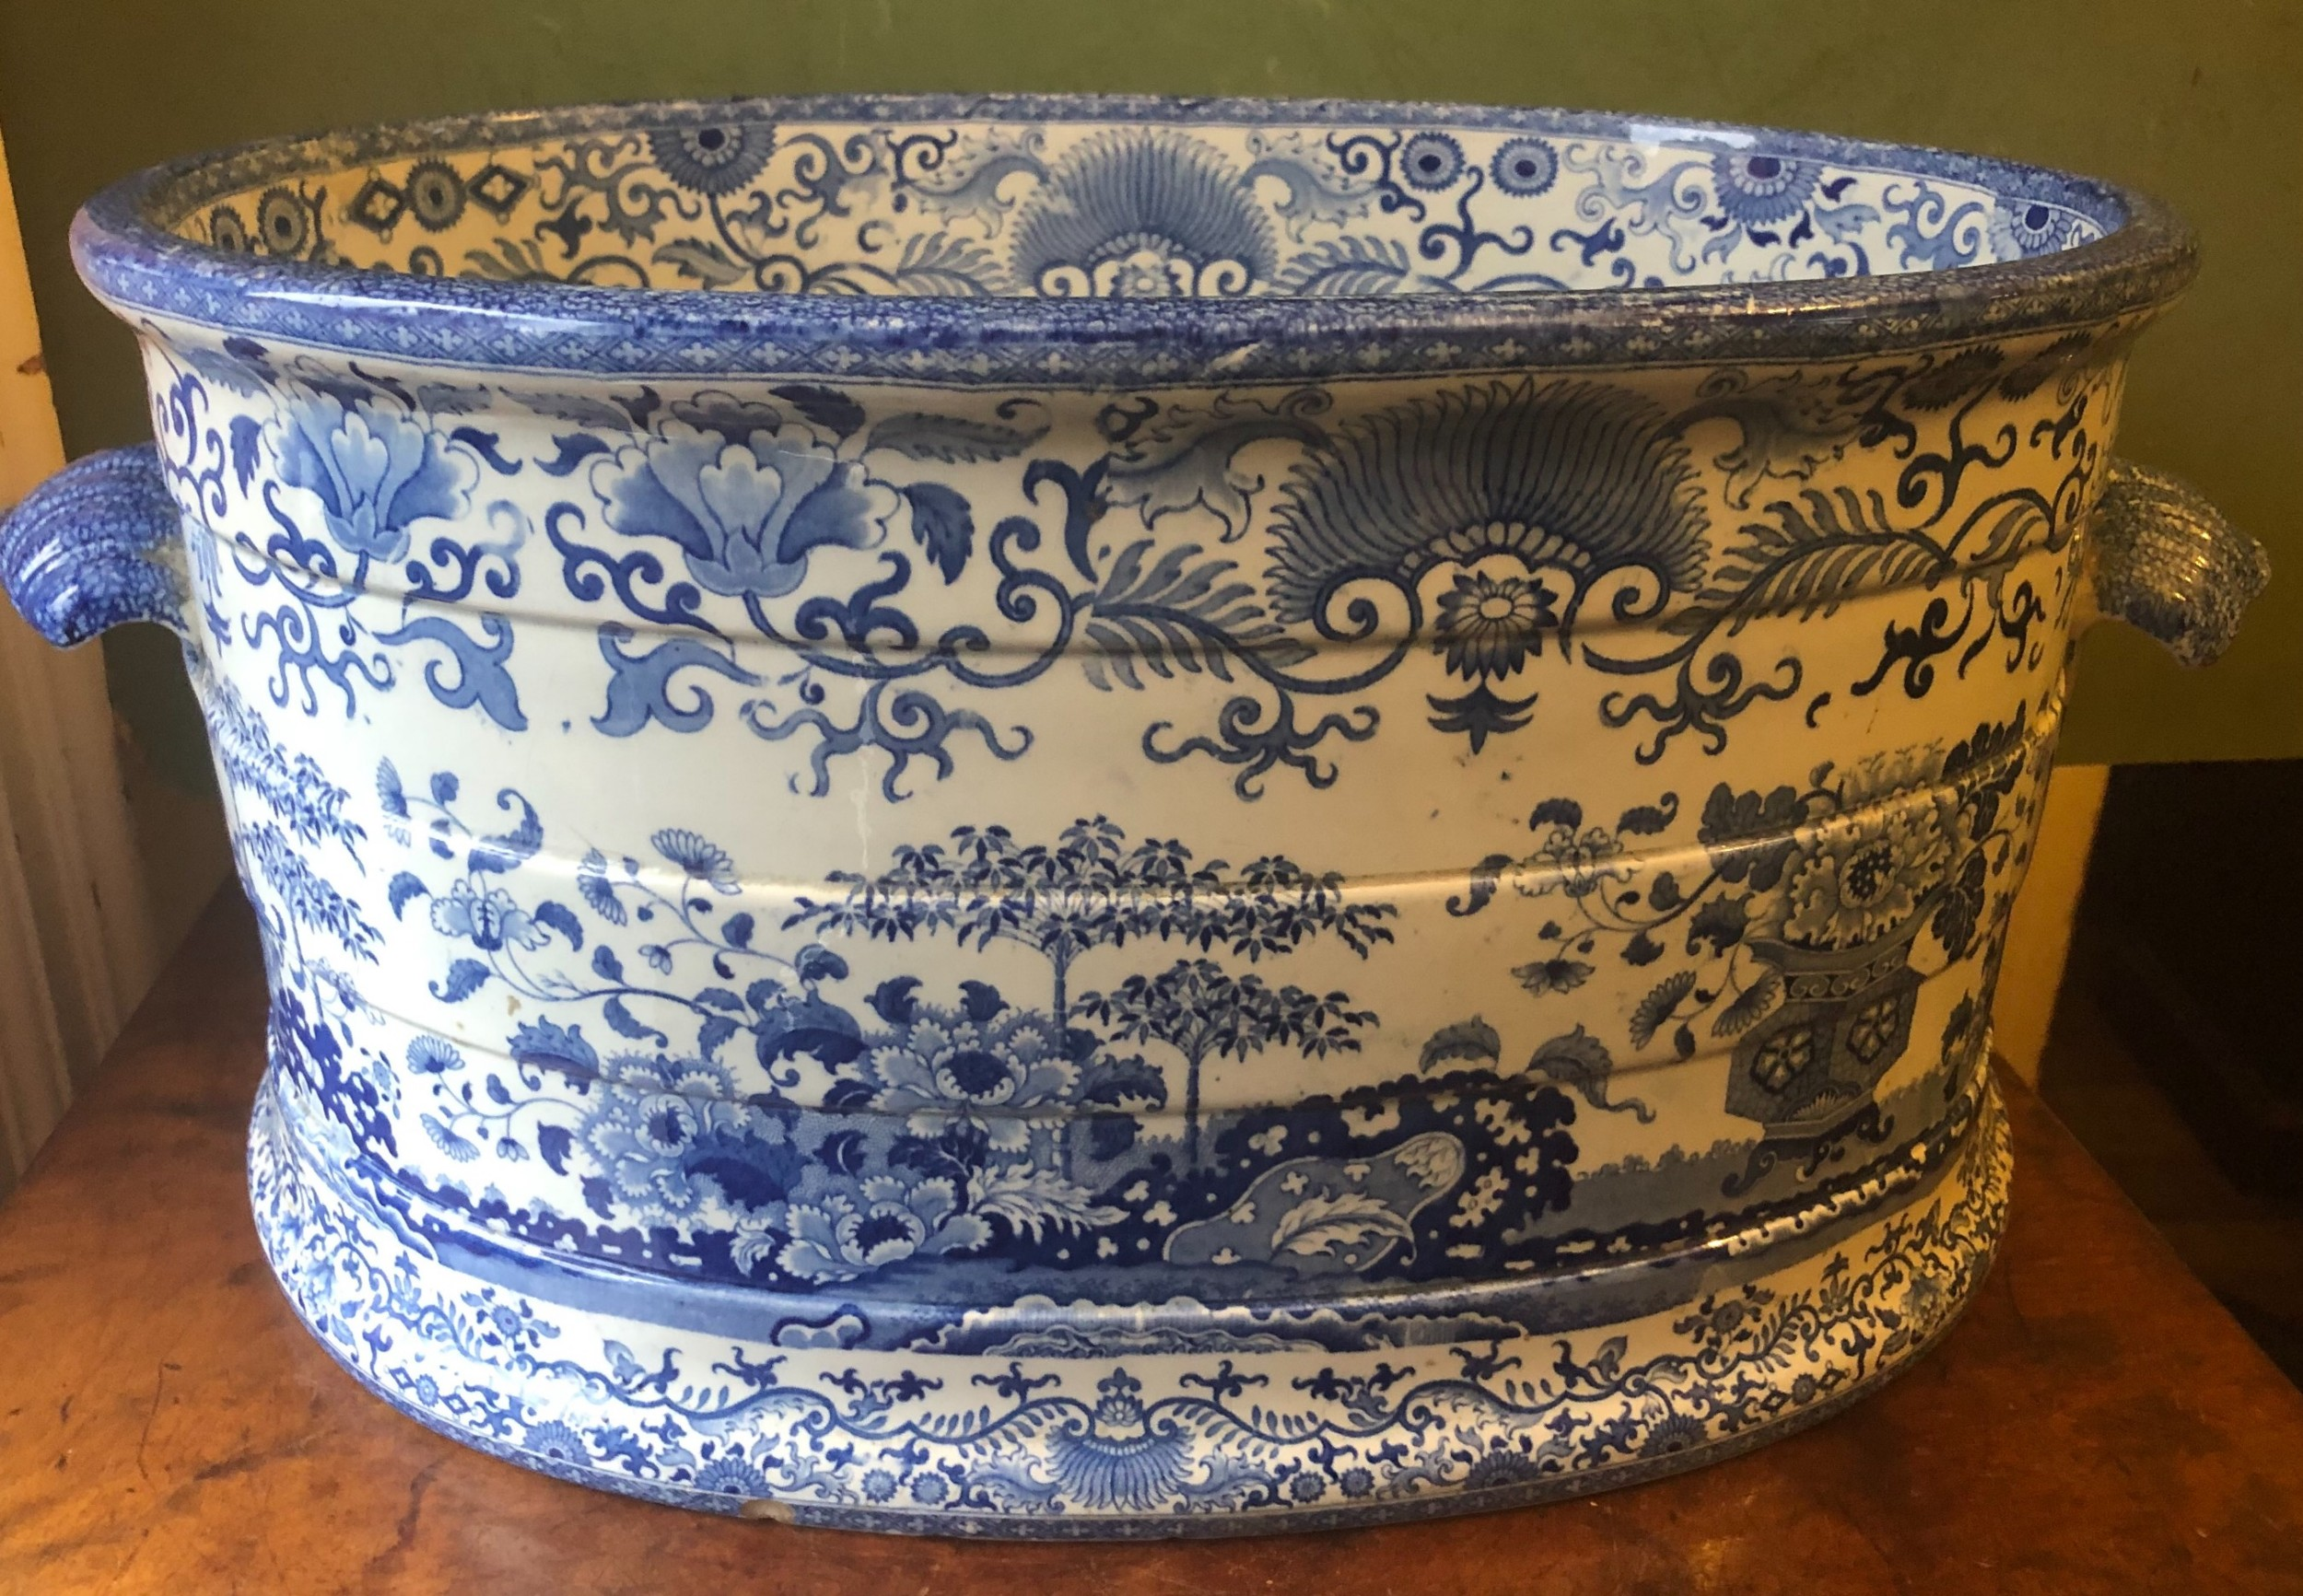 early c19th mintons blueandwhite transfer print pottery footbath